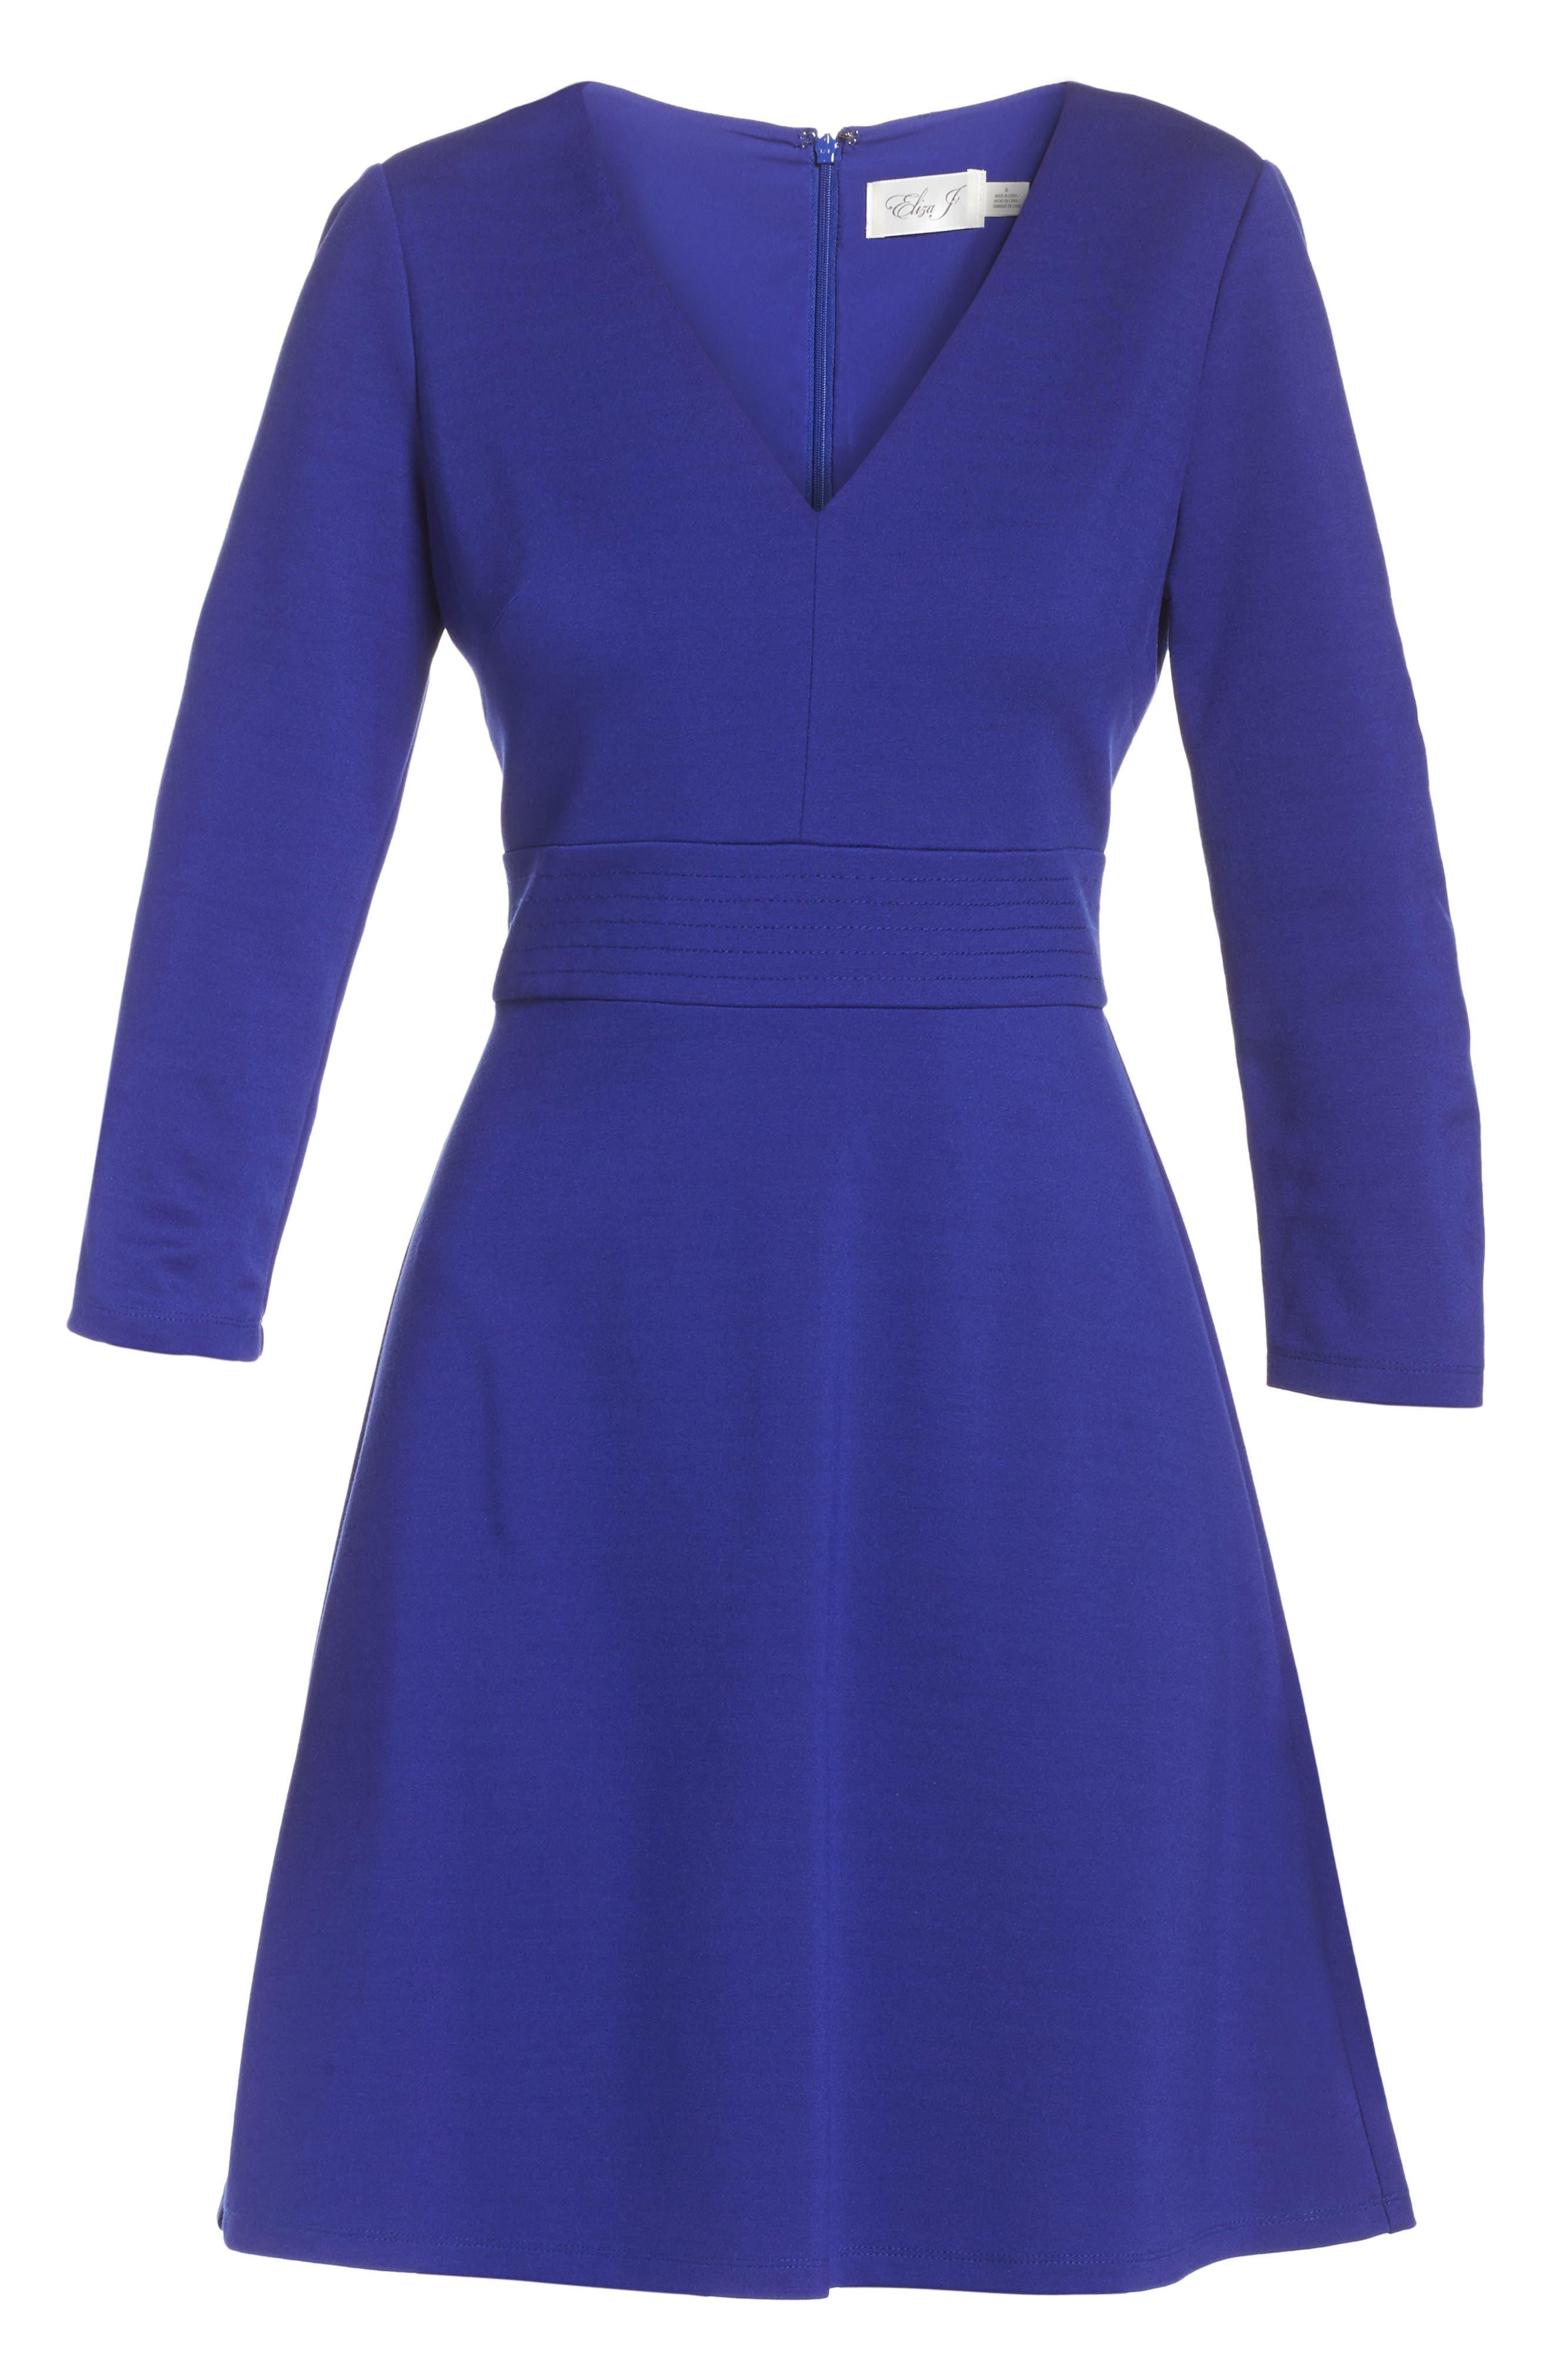 Fit & Flare Dress,                             Alternate thumbnail 6, color,                             430